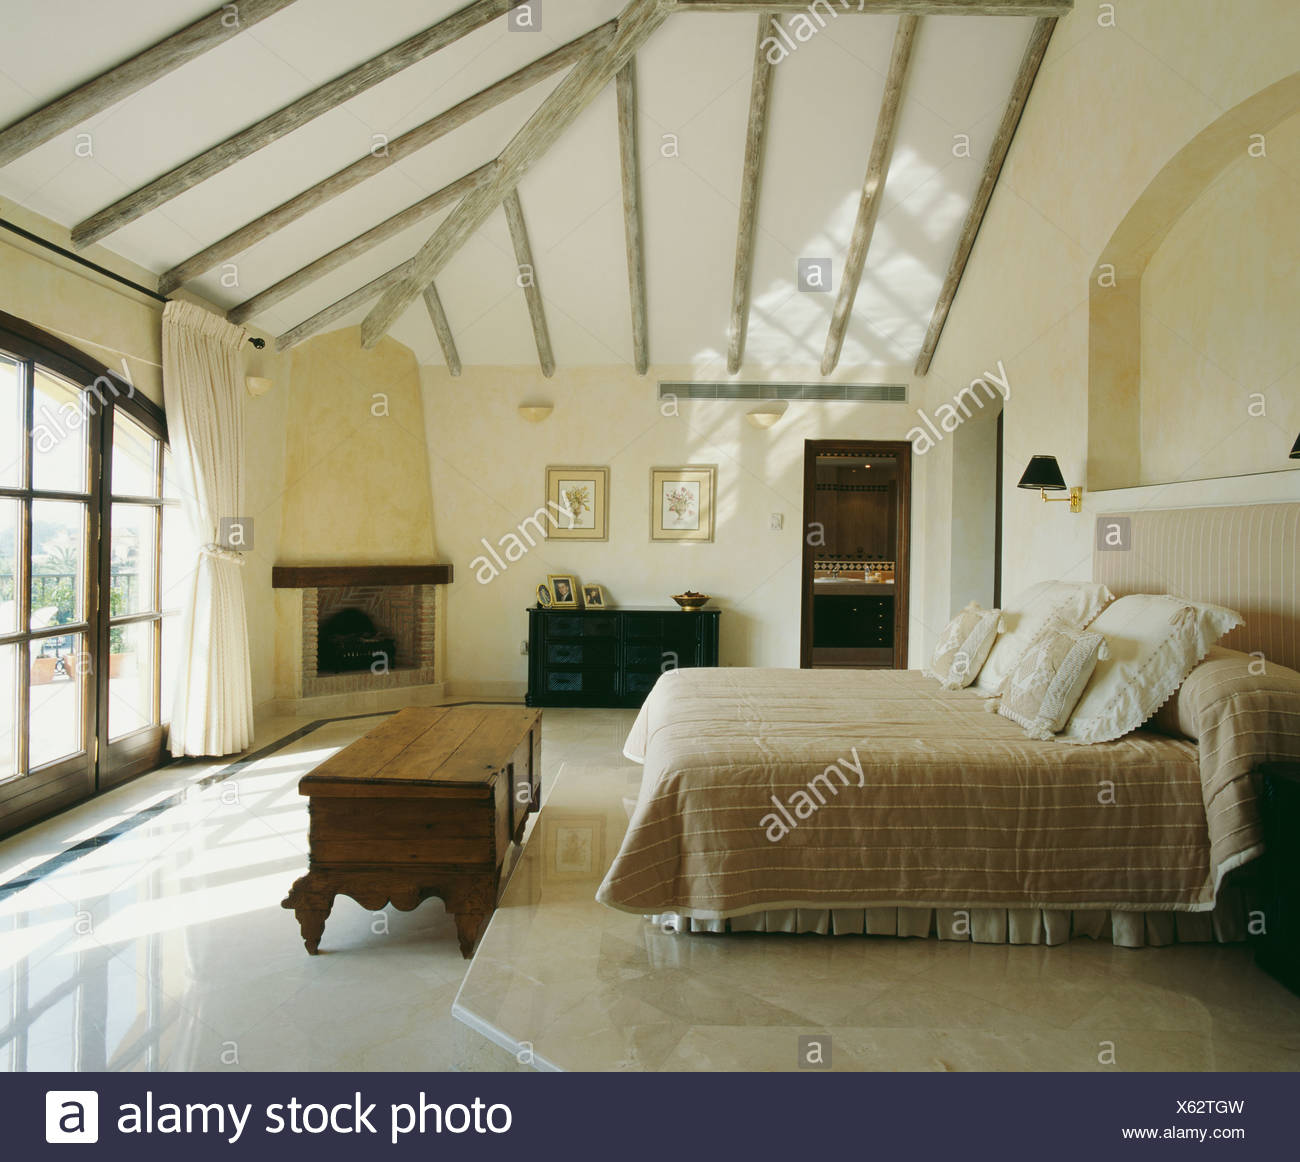 Attics Bedrooms Interiors Conversion Stock Photos & Attics ...